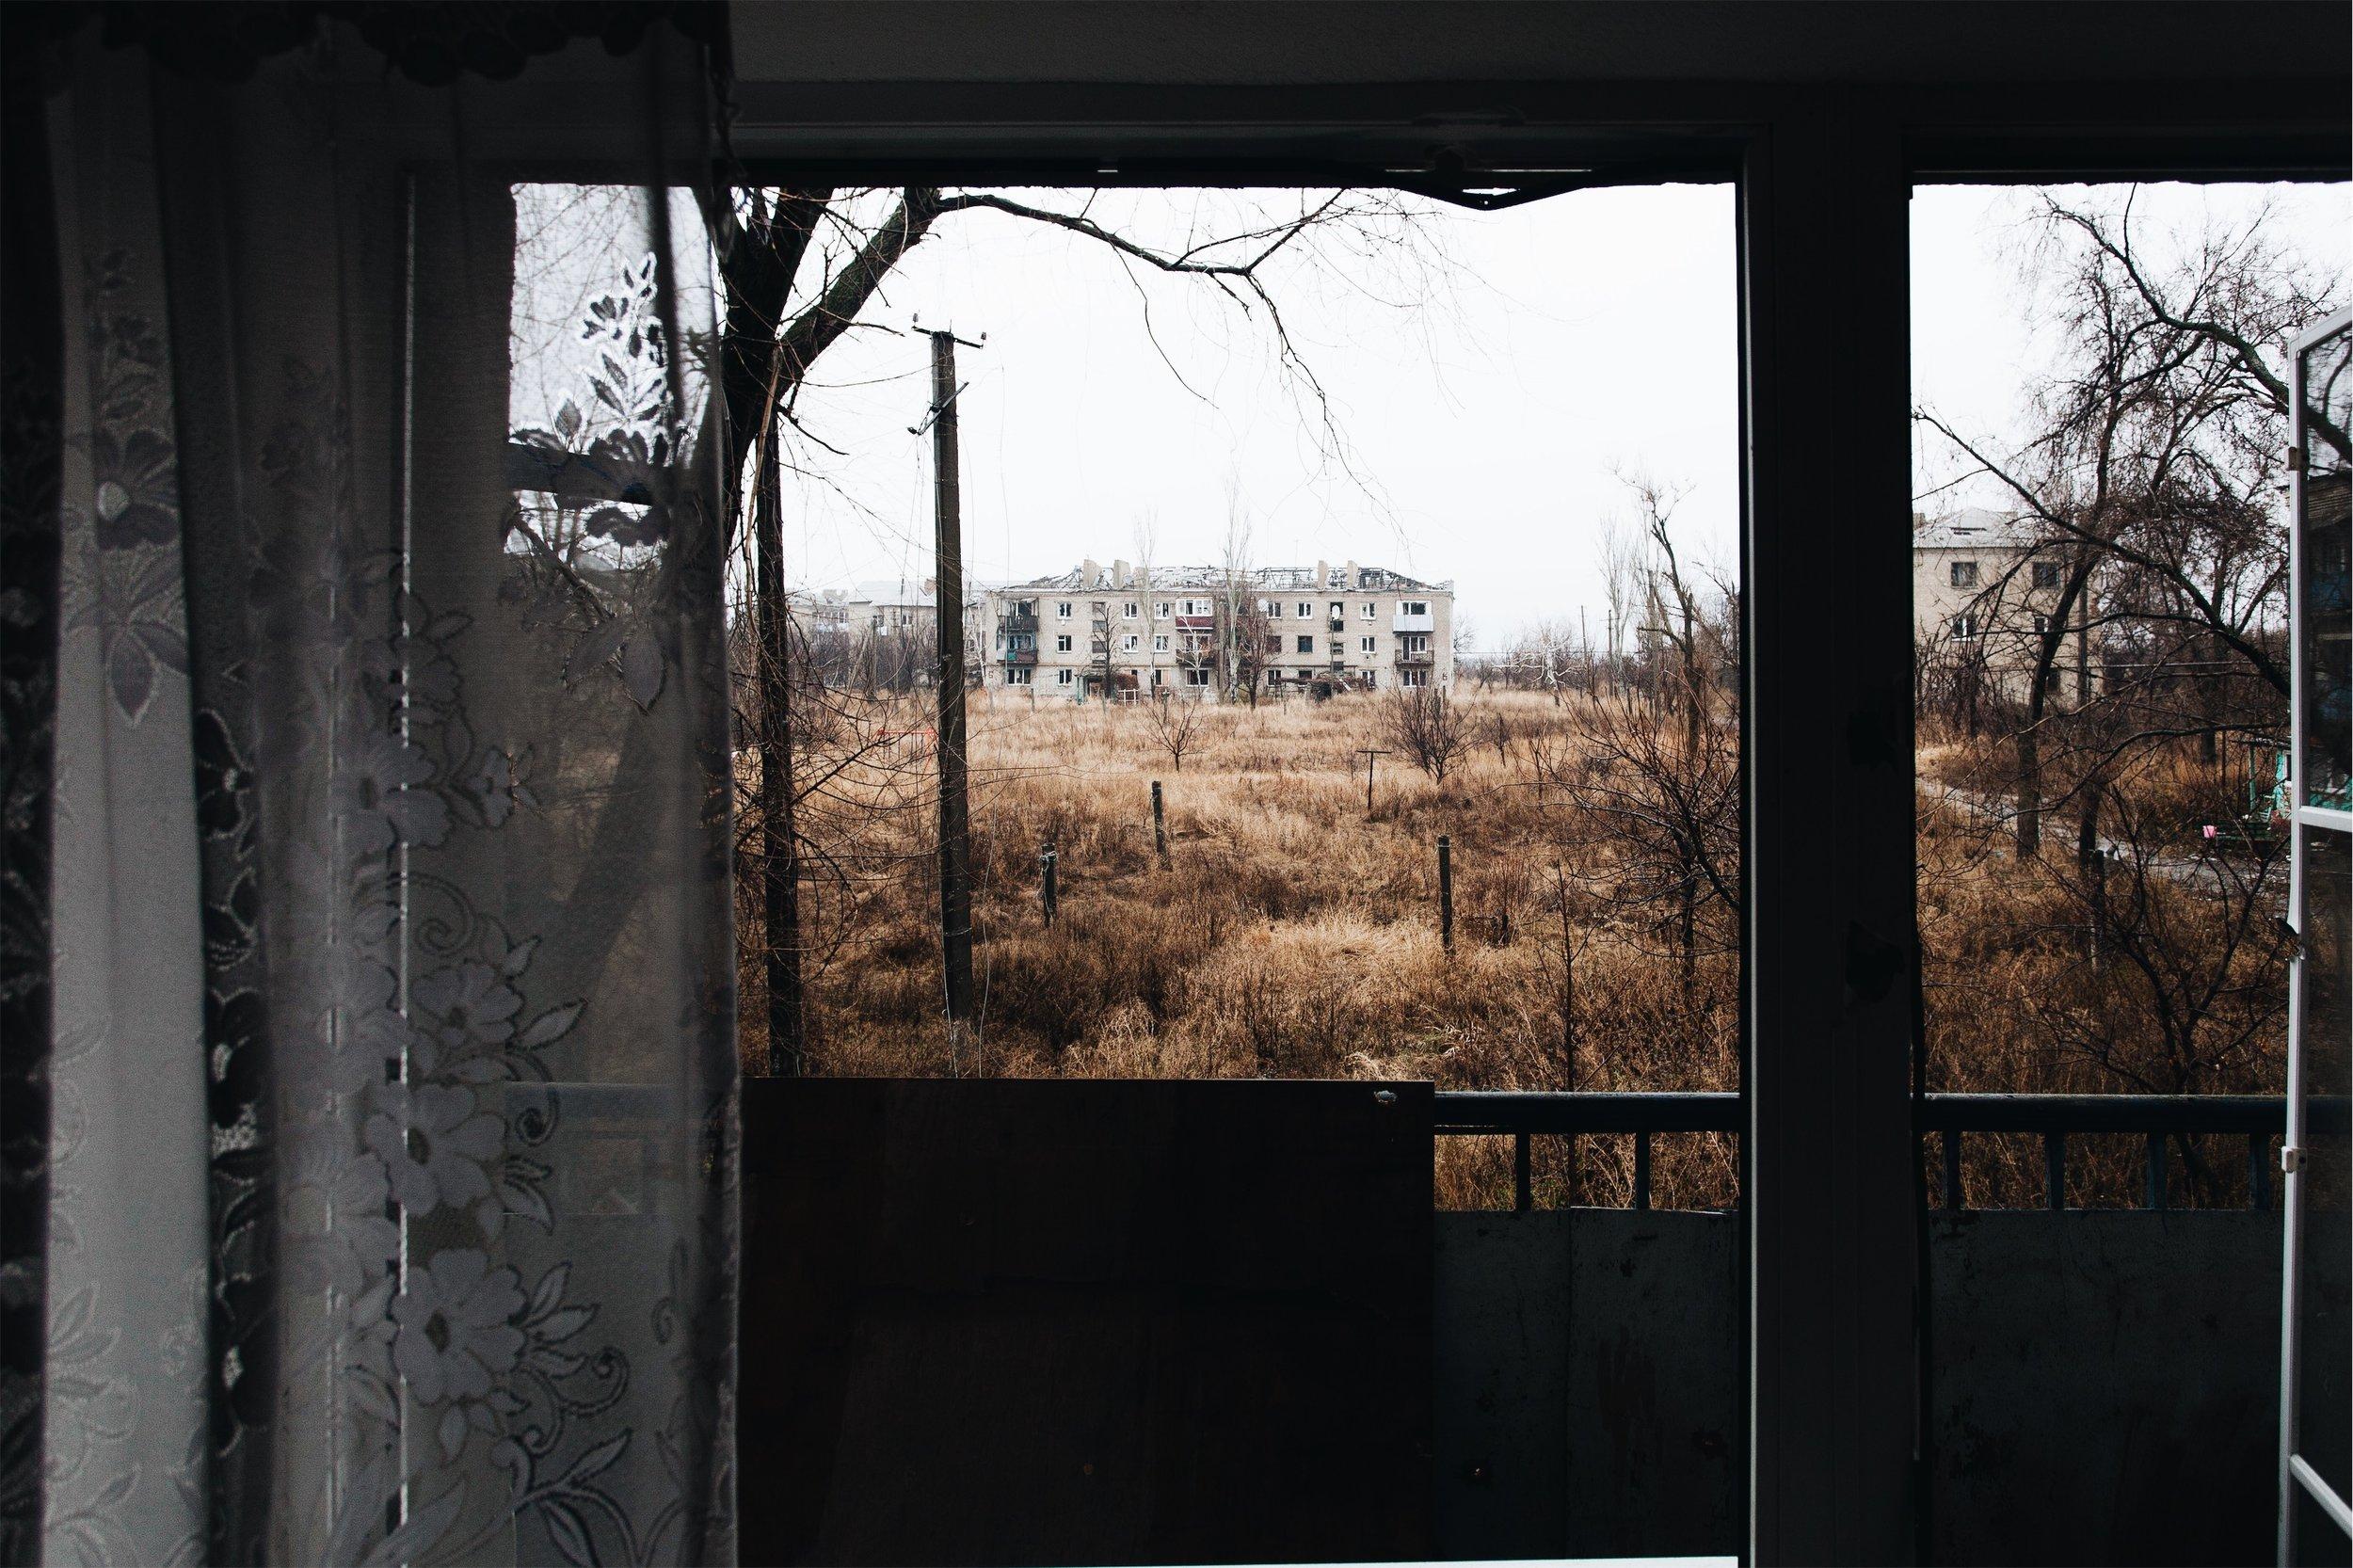 ausdemfenster.jpeg